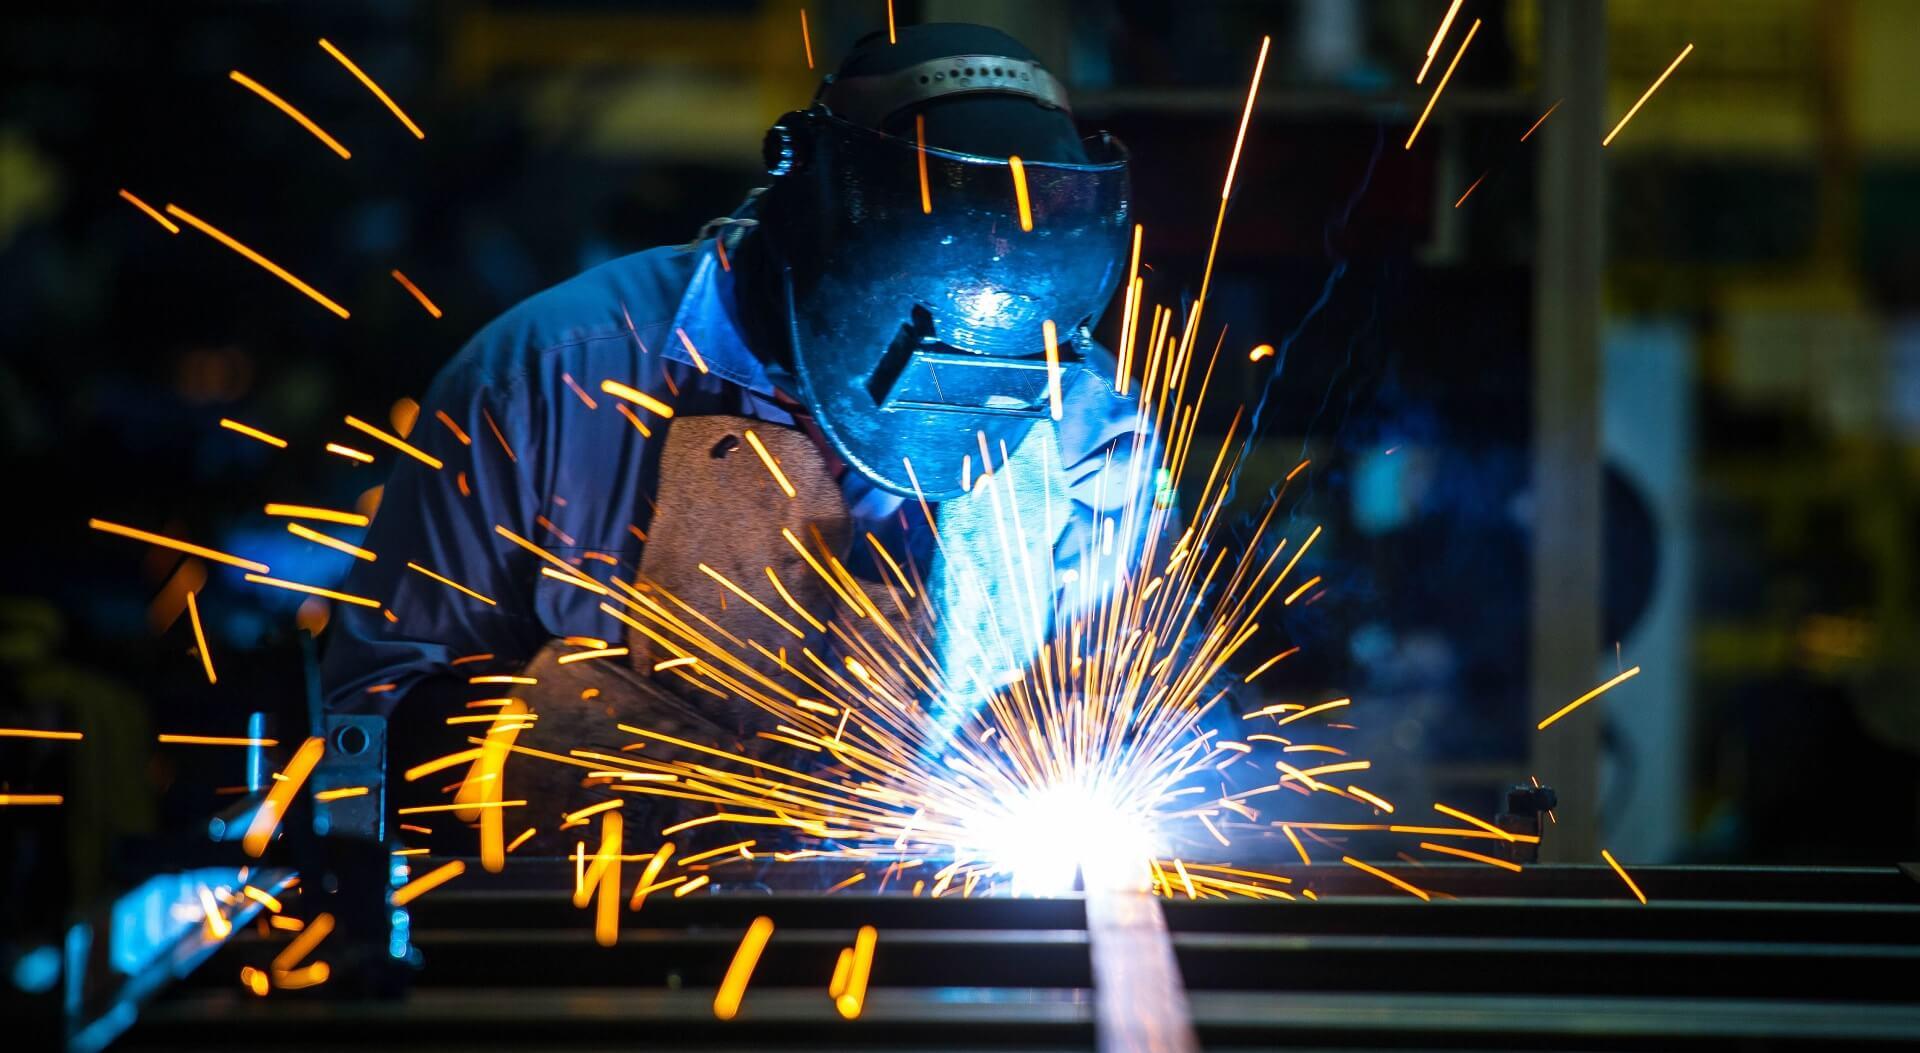 welding services brisbane - jzee services brisbane qld